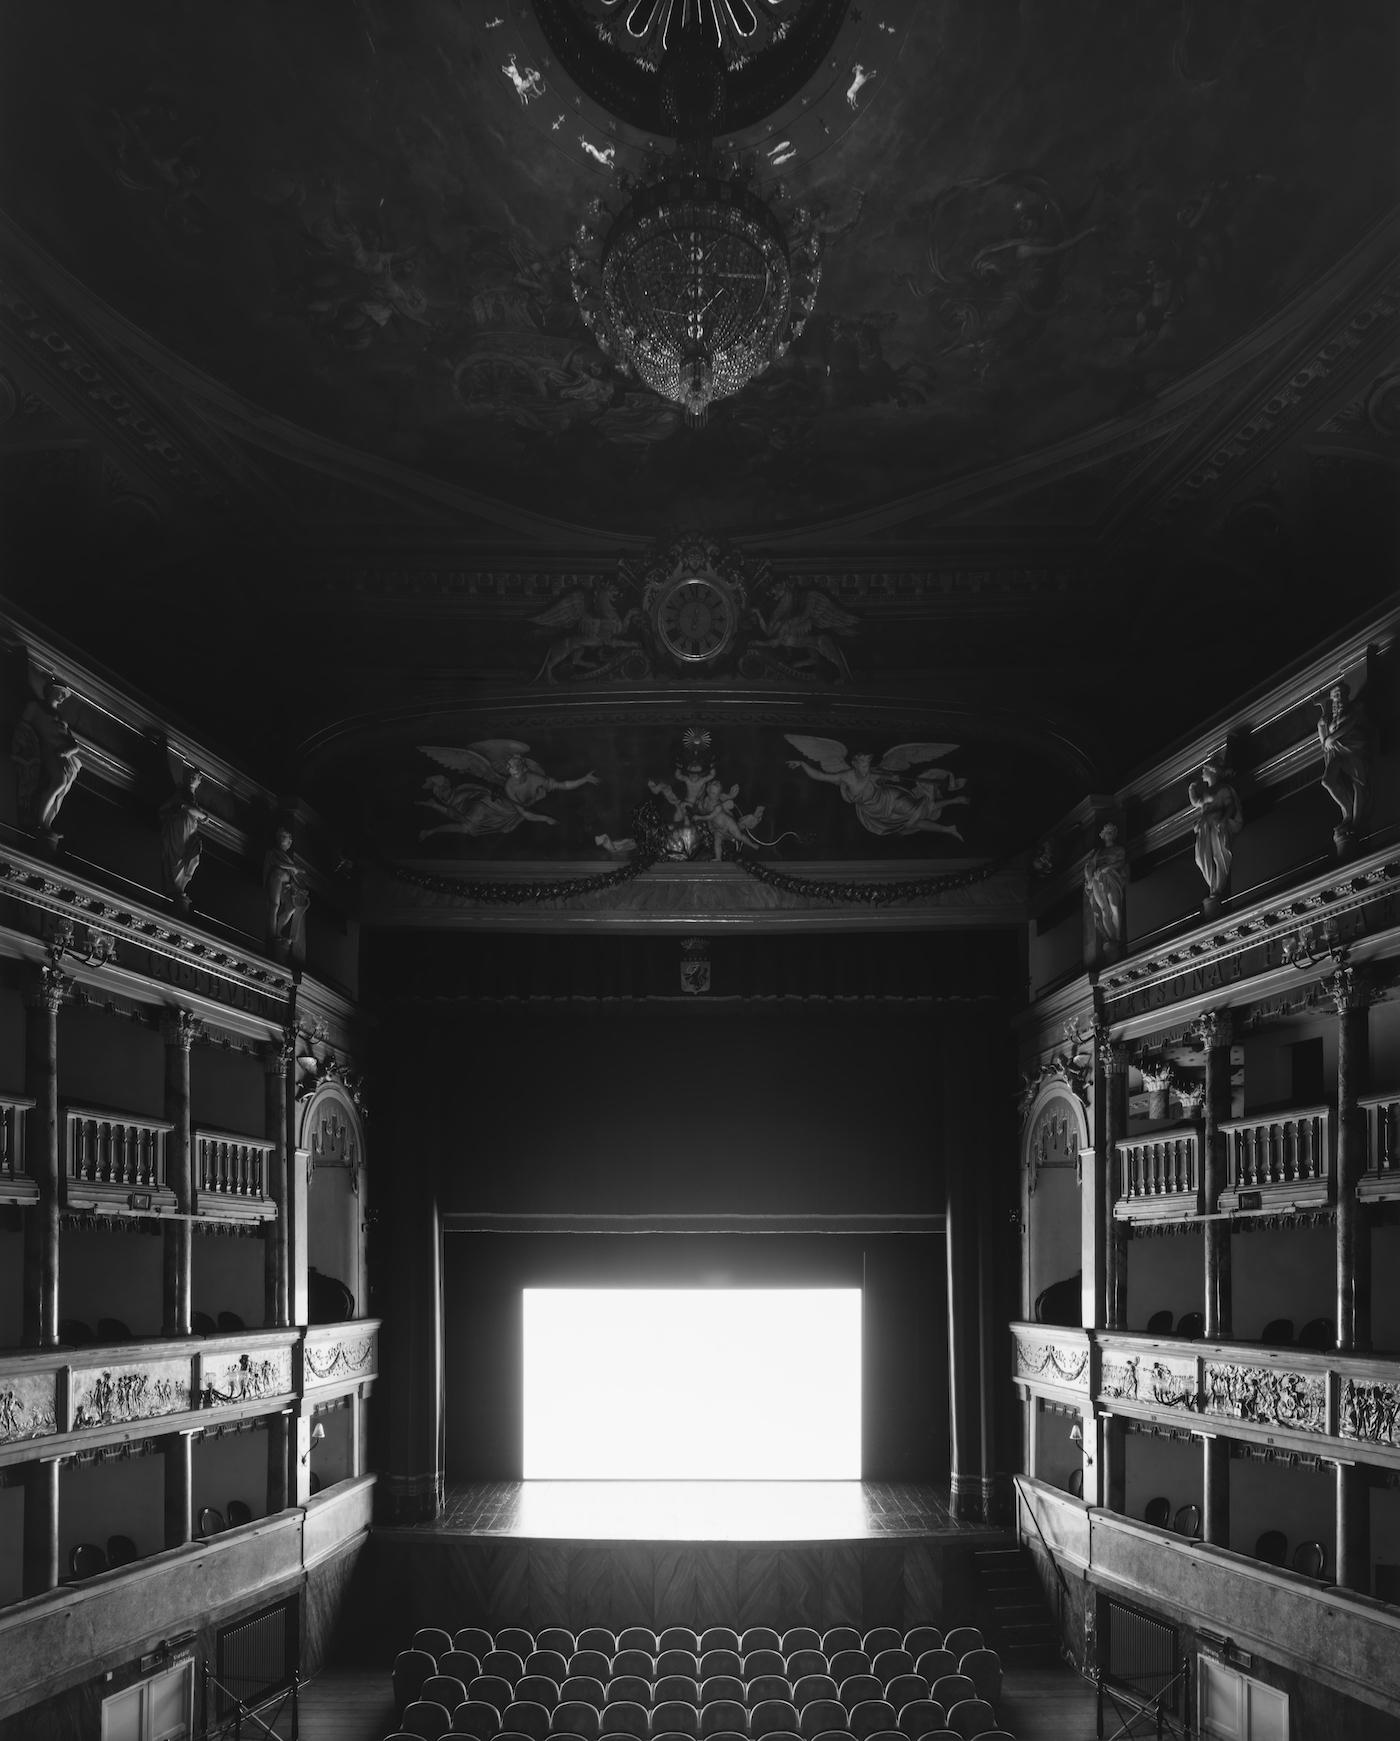 teatro-comunale-masini-faenza-2015